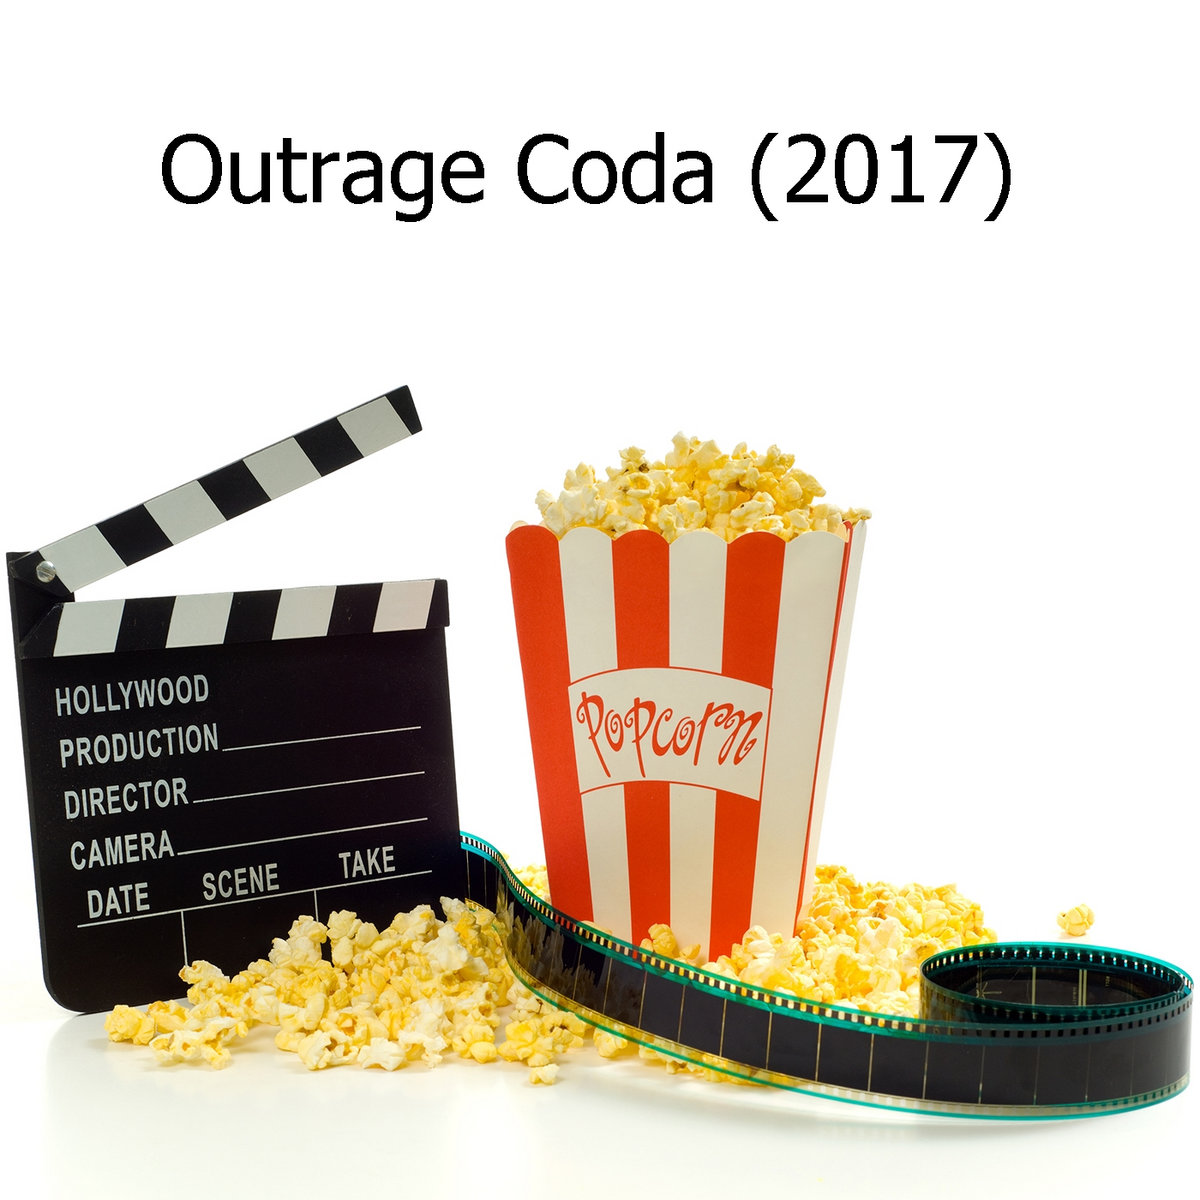 outrage coda 2017 online